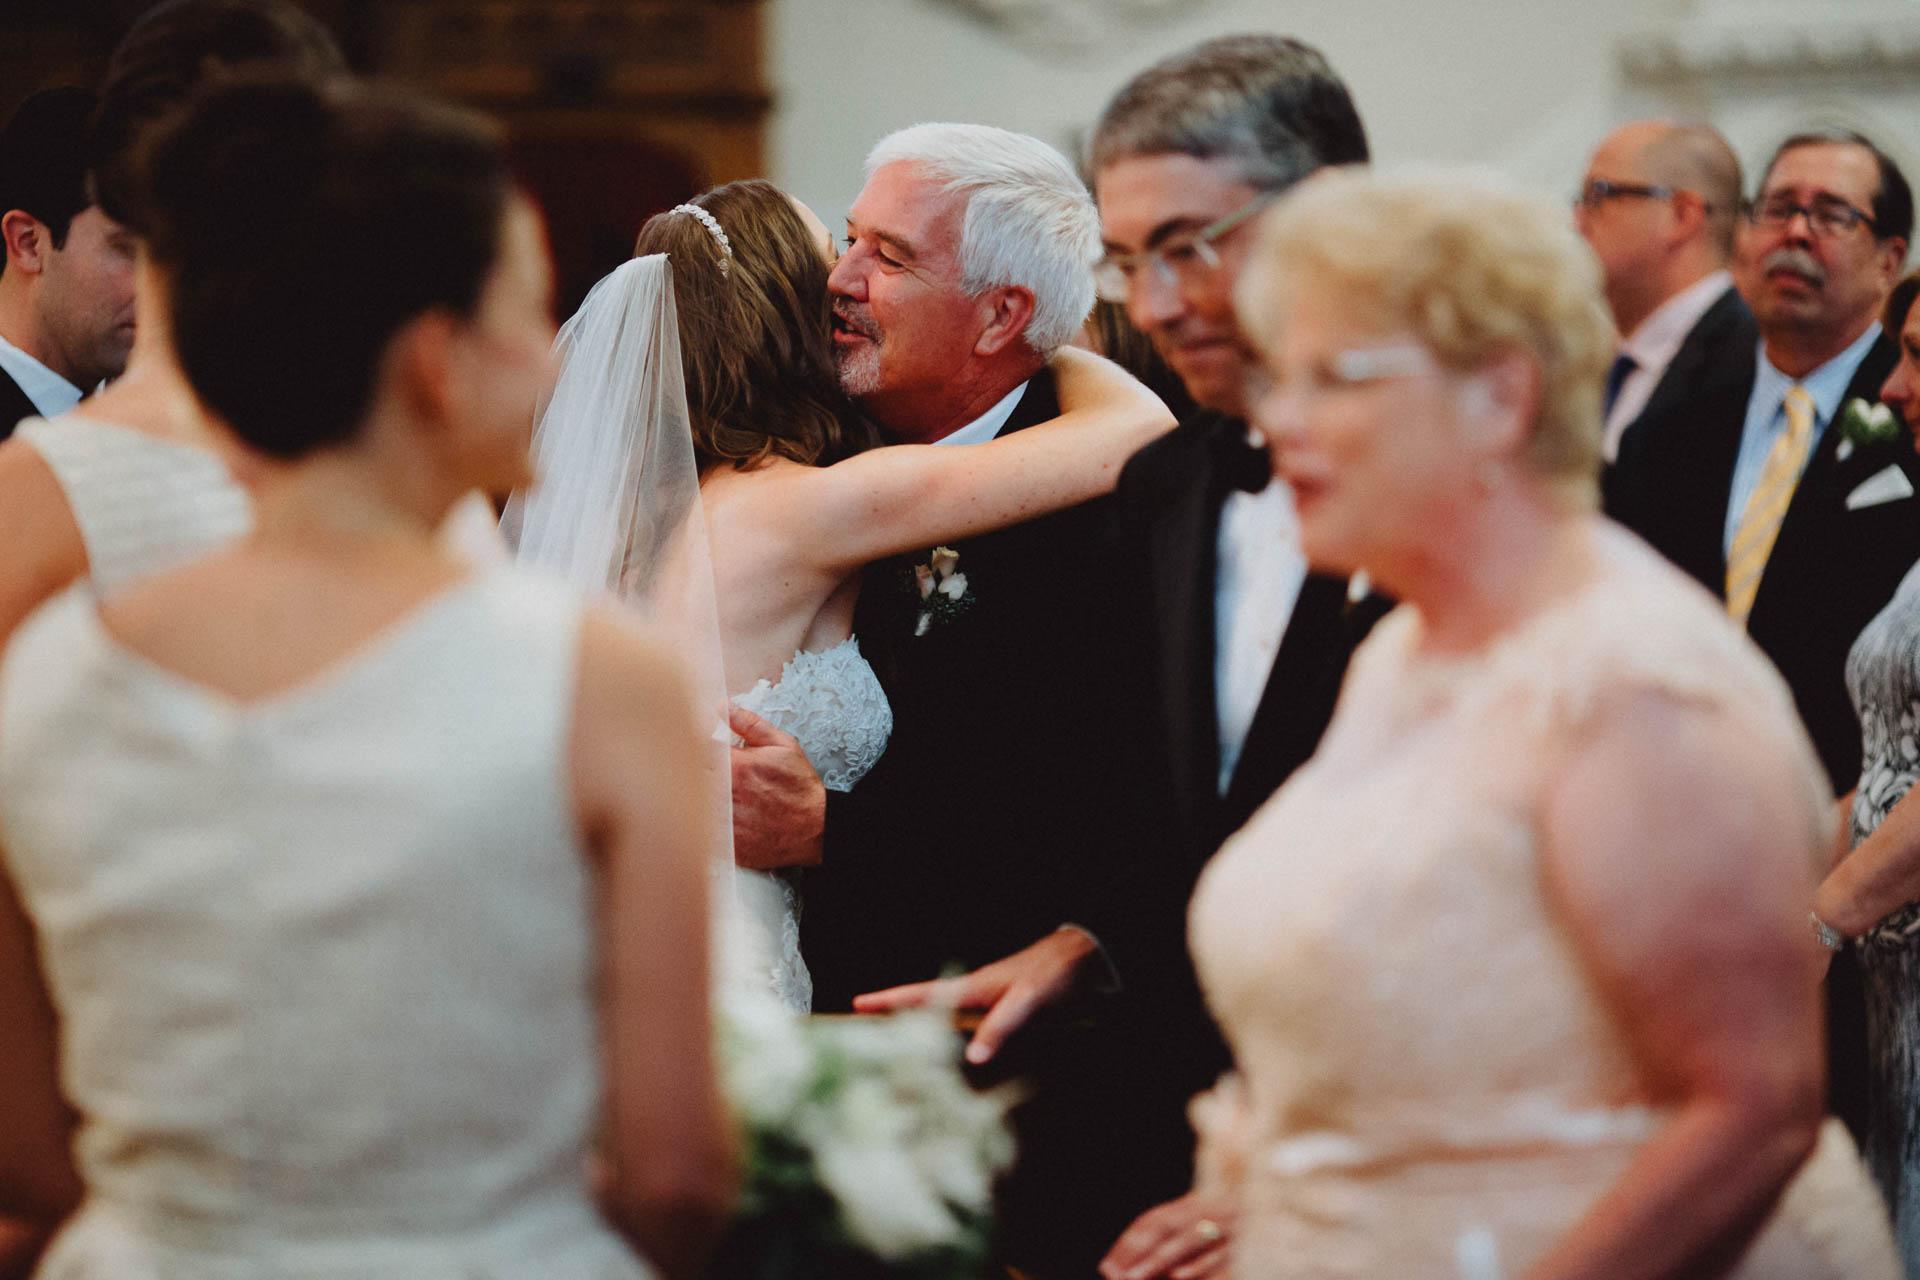 Keri-Joseph-Top-of-the-Market-Wedding-080@2x.jpg